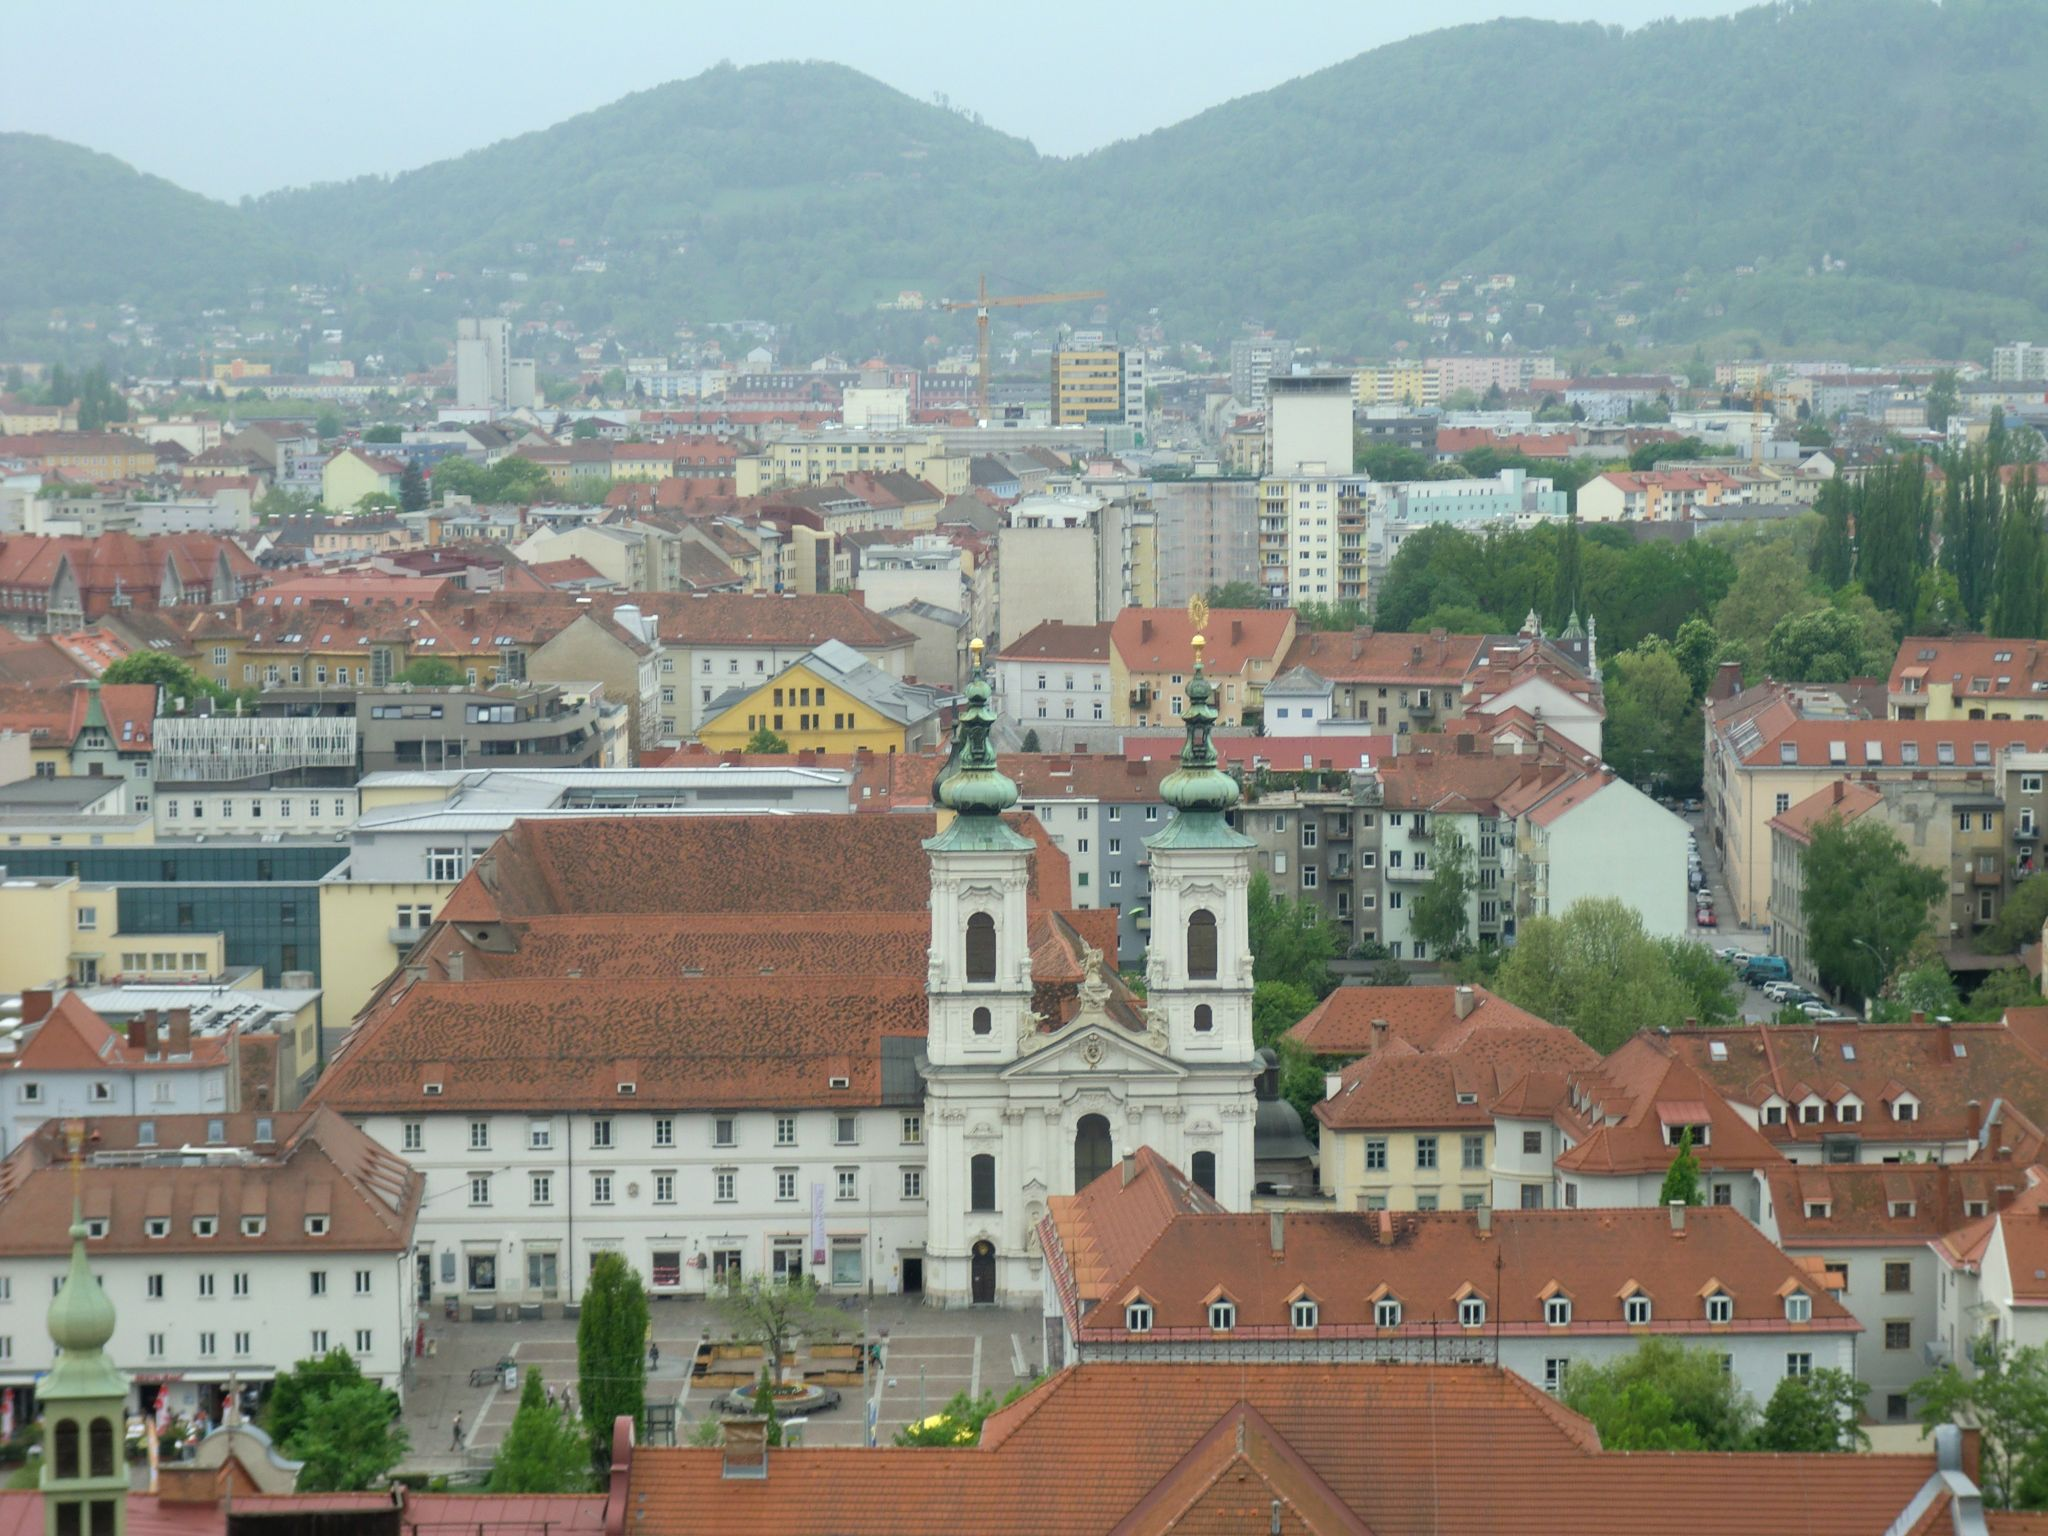 Graz view 6 - Graz: tradition and modernity